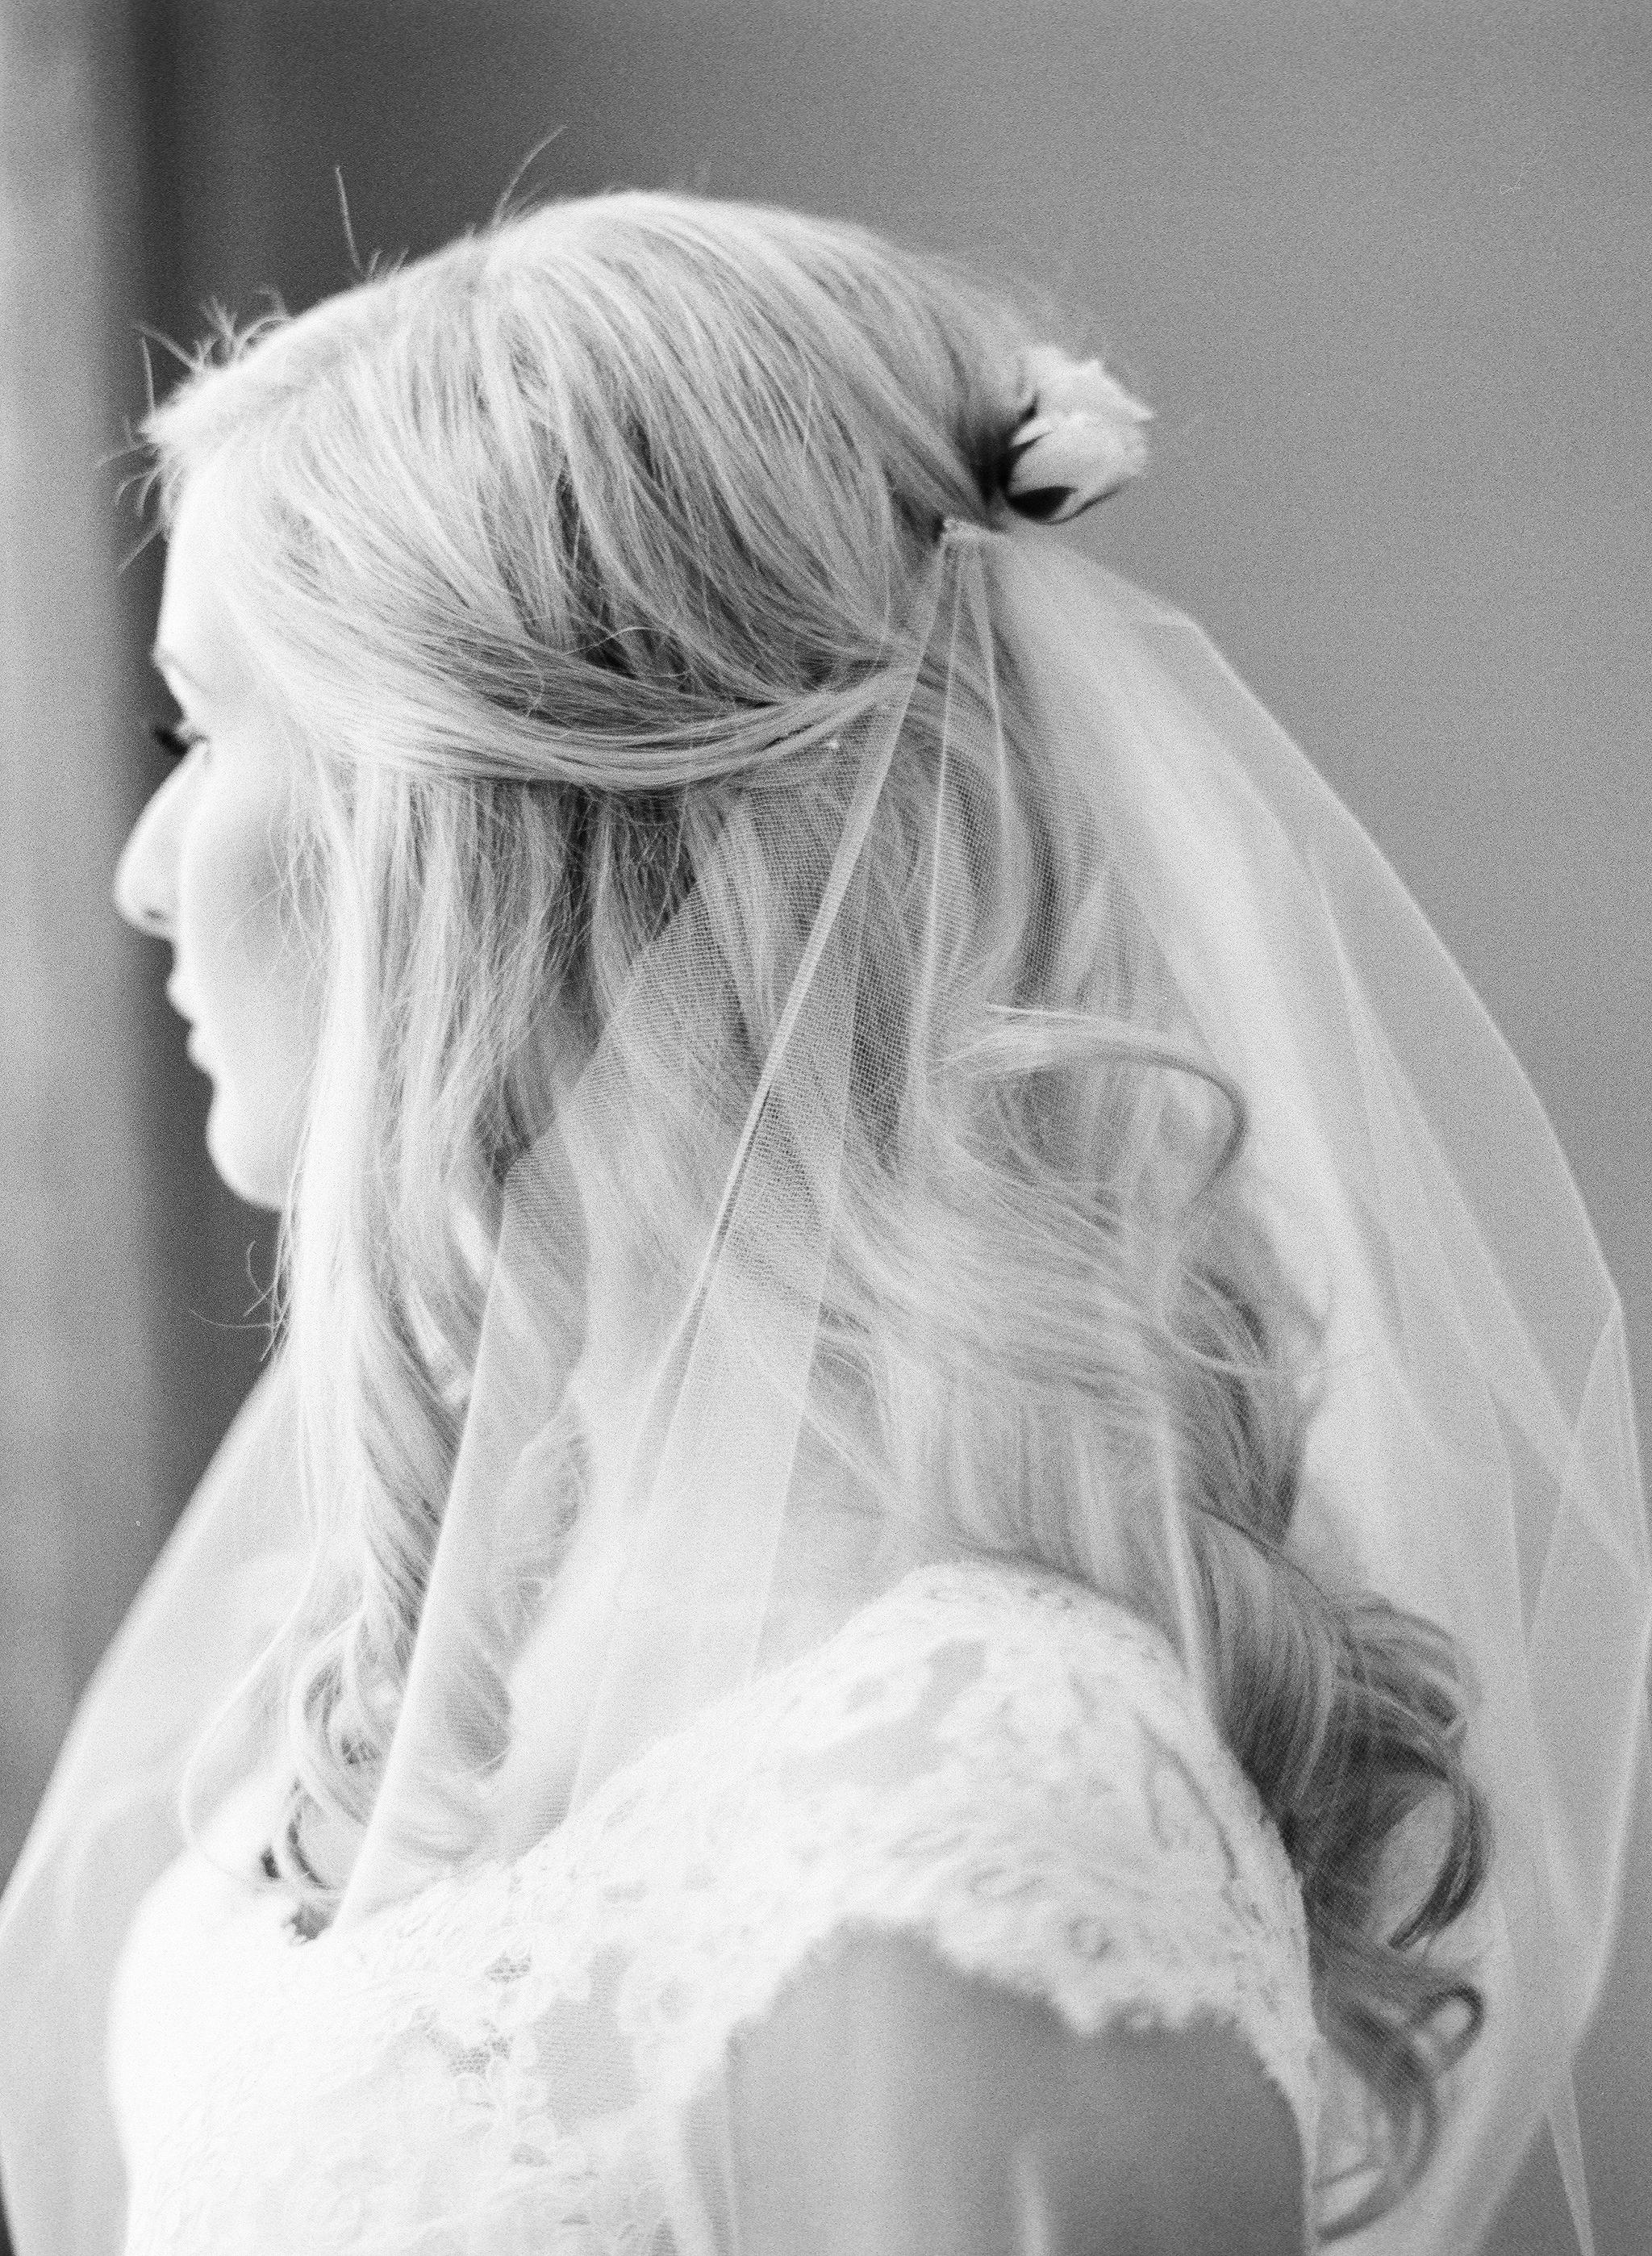 Ceci_New_York_Florida_Wedding_Style_Bride_Watercolor_Real_Custom_Luxury_34.jpg